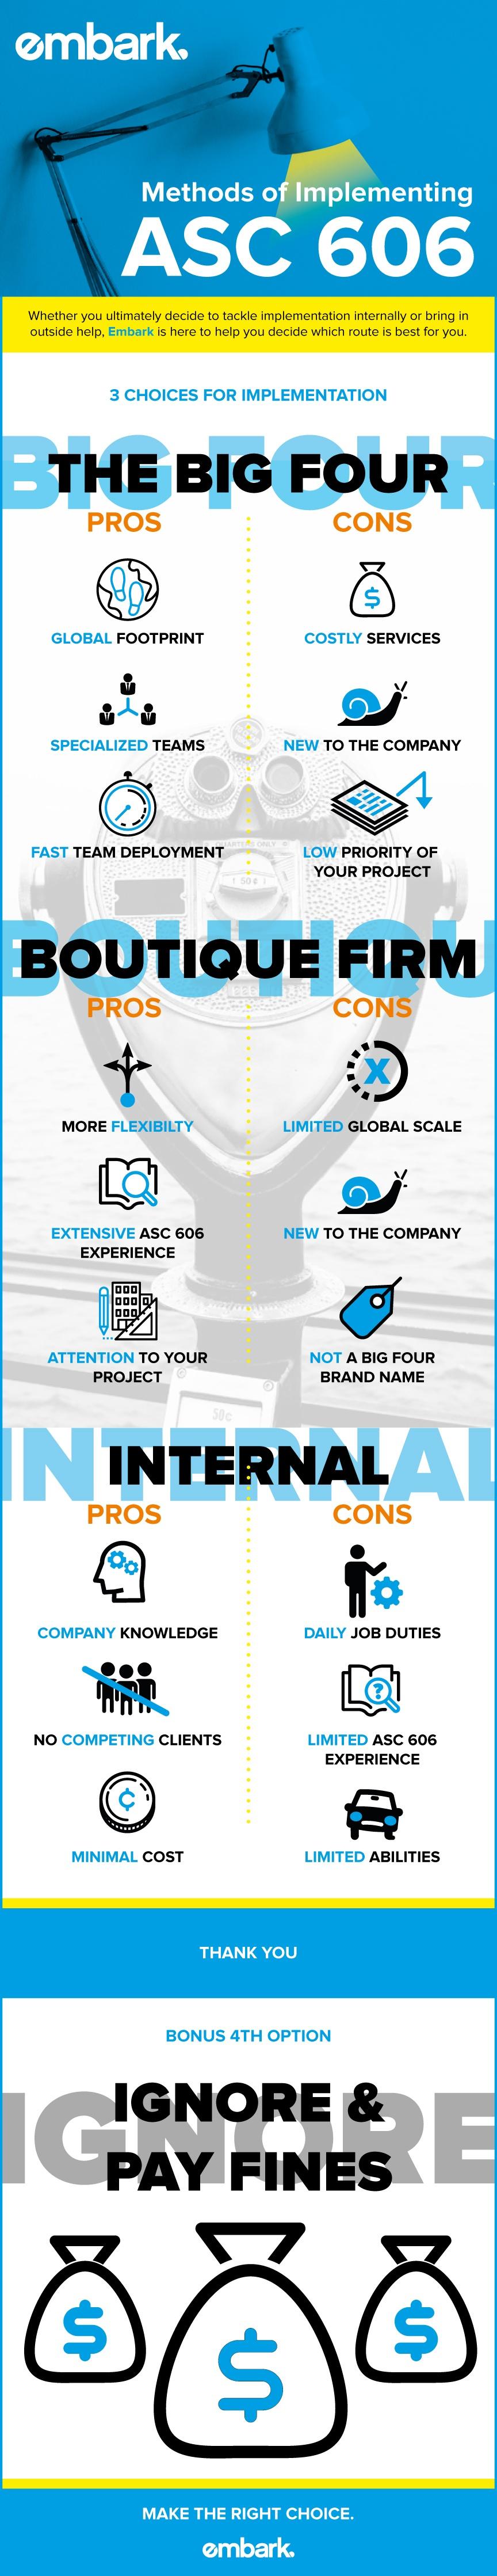 Embark_infographic_ASC606.jpg